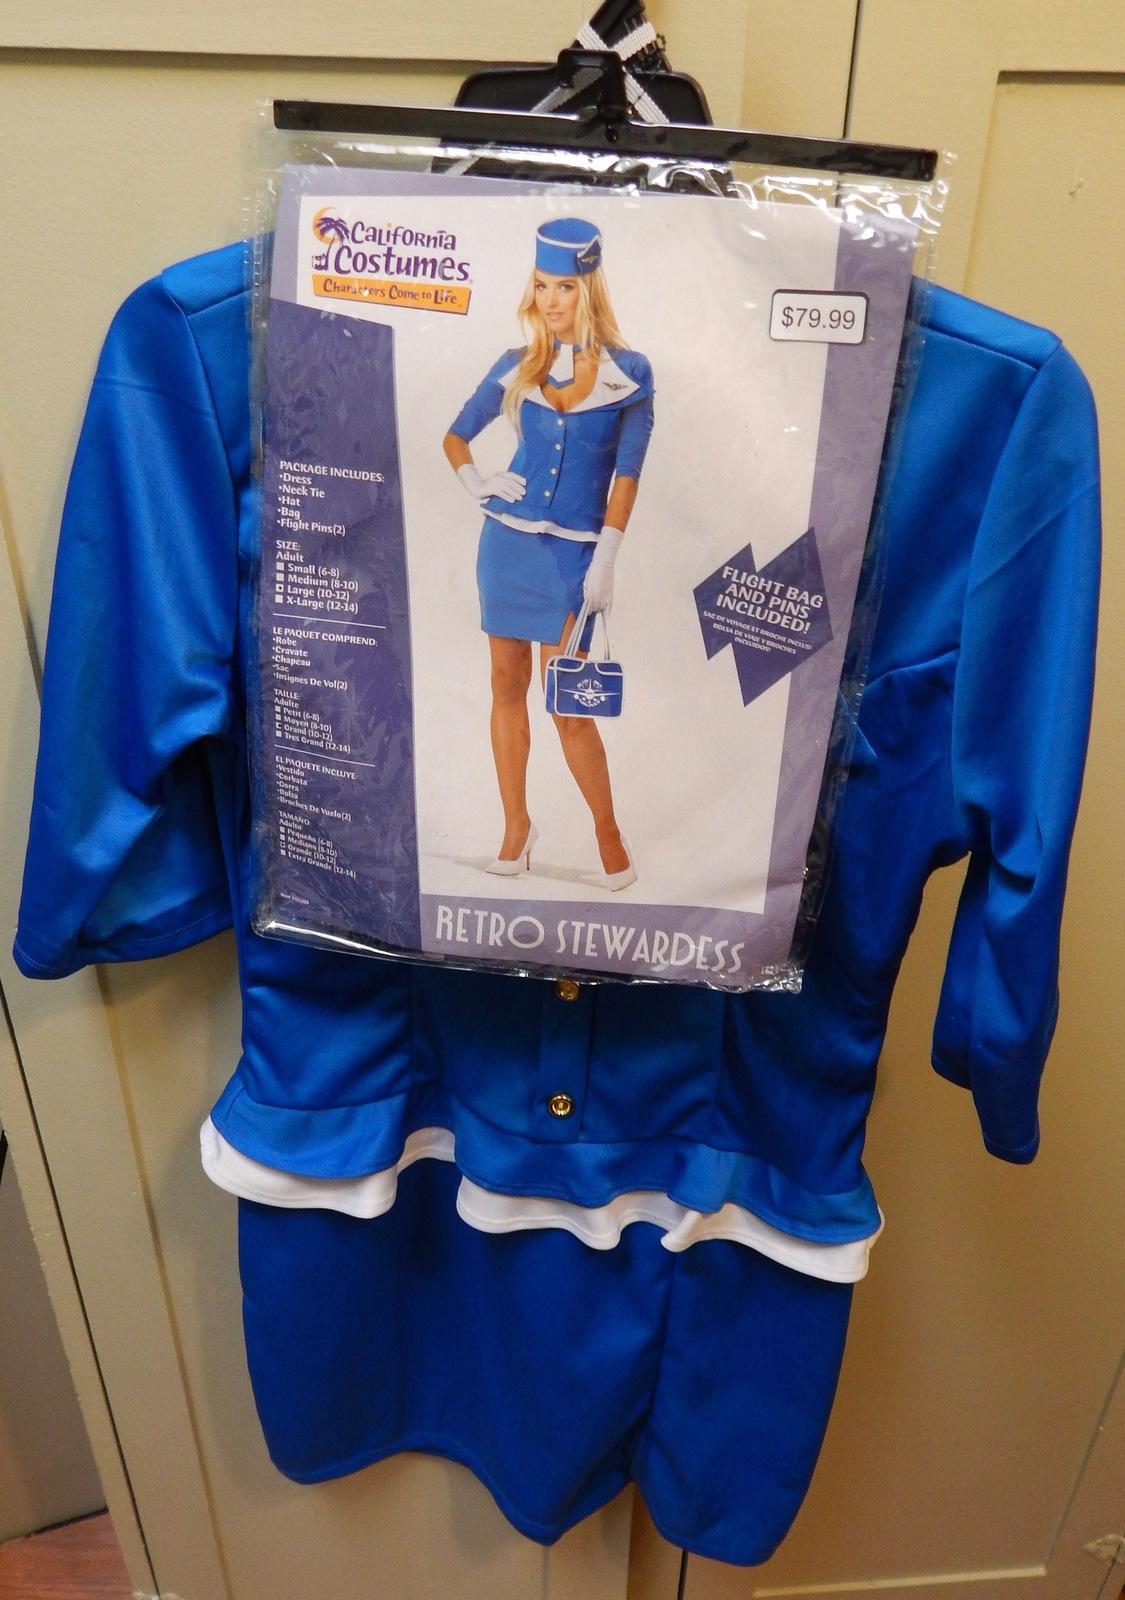 8ae46e7b45d52 California Costumes Retro Stewardess and 50 similar items